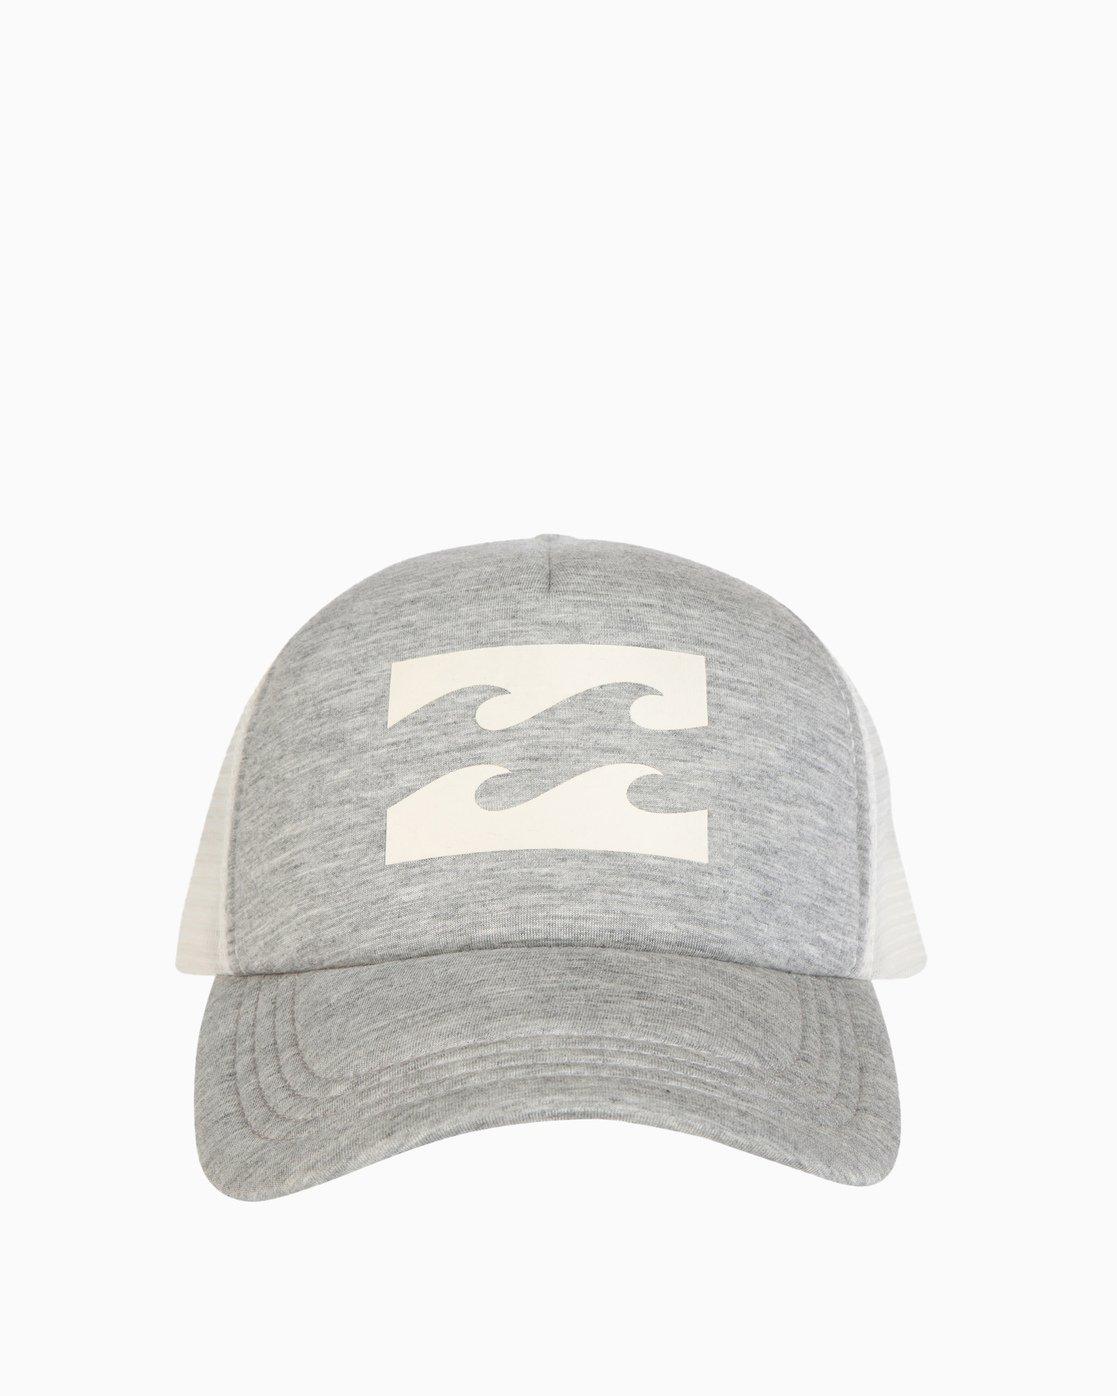 69bc71b052cff 1 Billabong Trucker Hat Grey JAHTDBIL Billabong